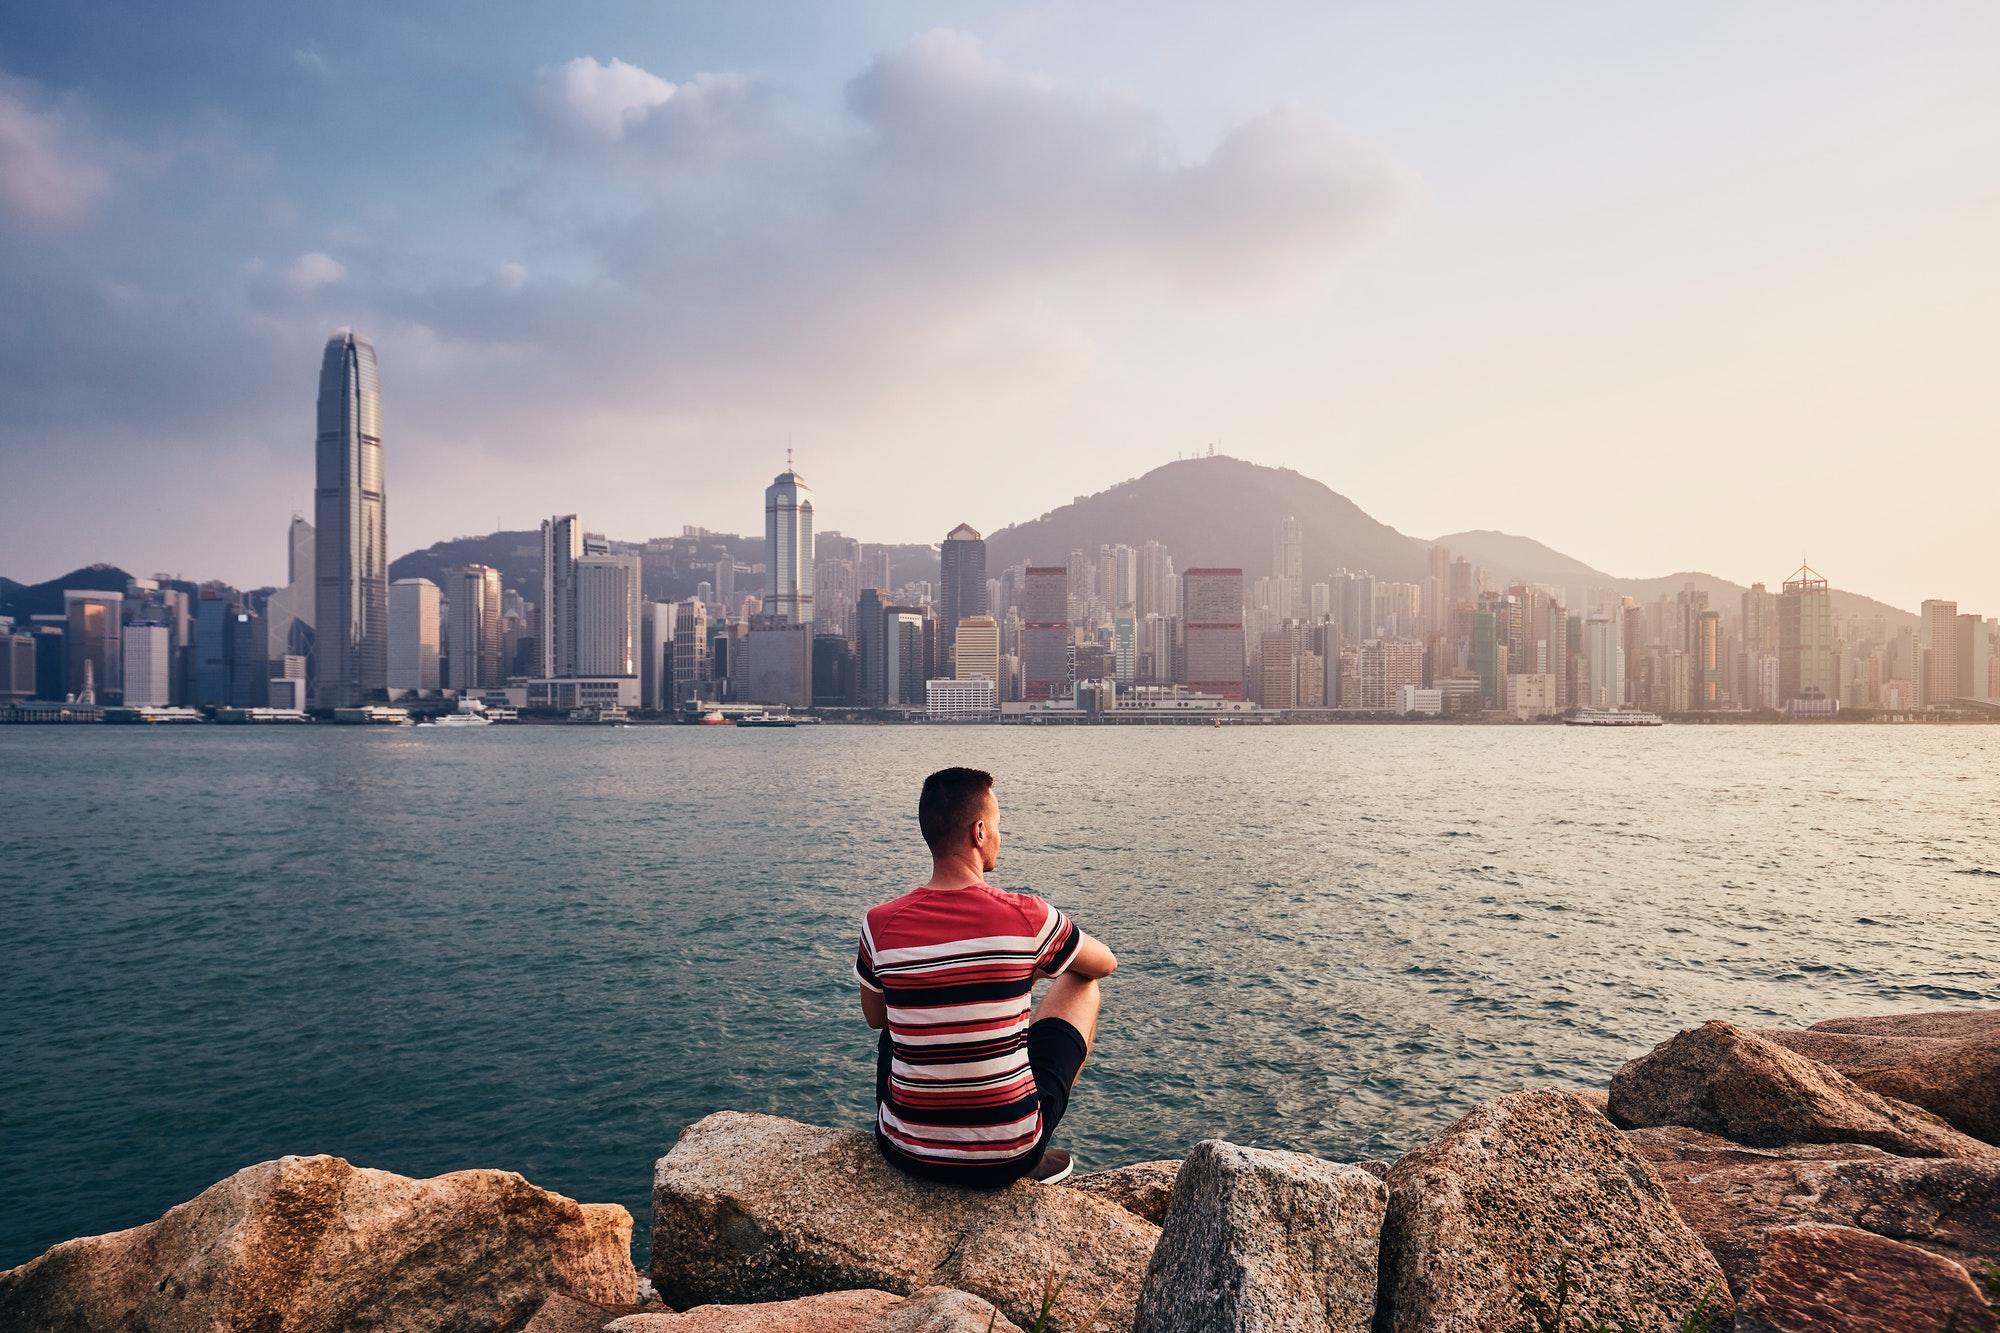 Hong Kong Passport Holders' Regulations Released